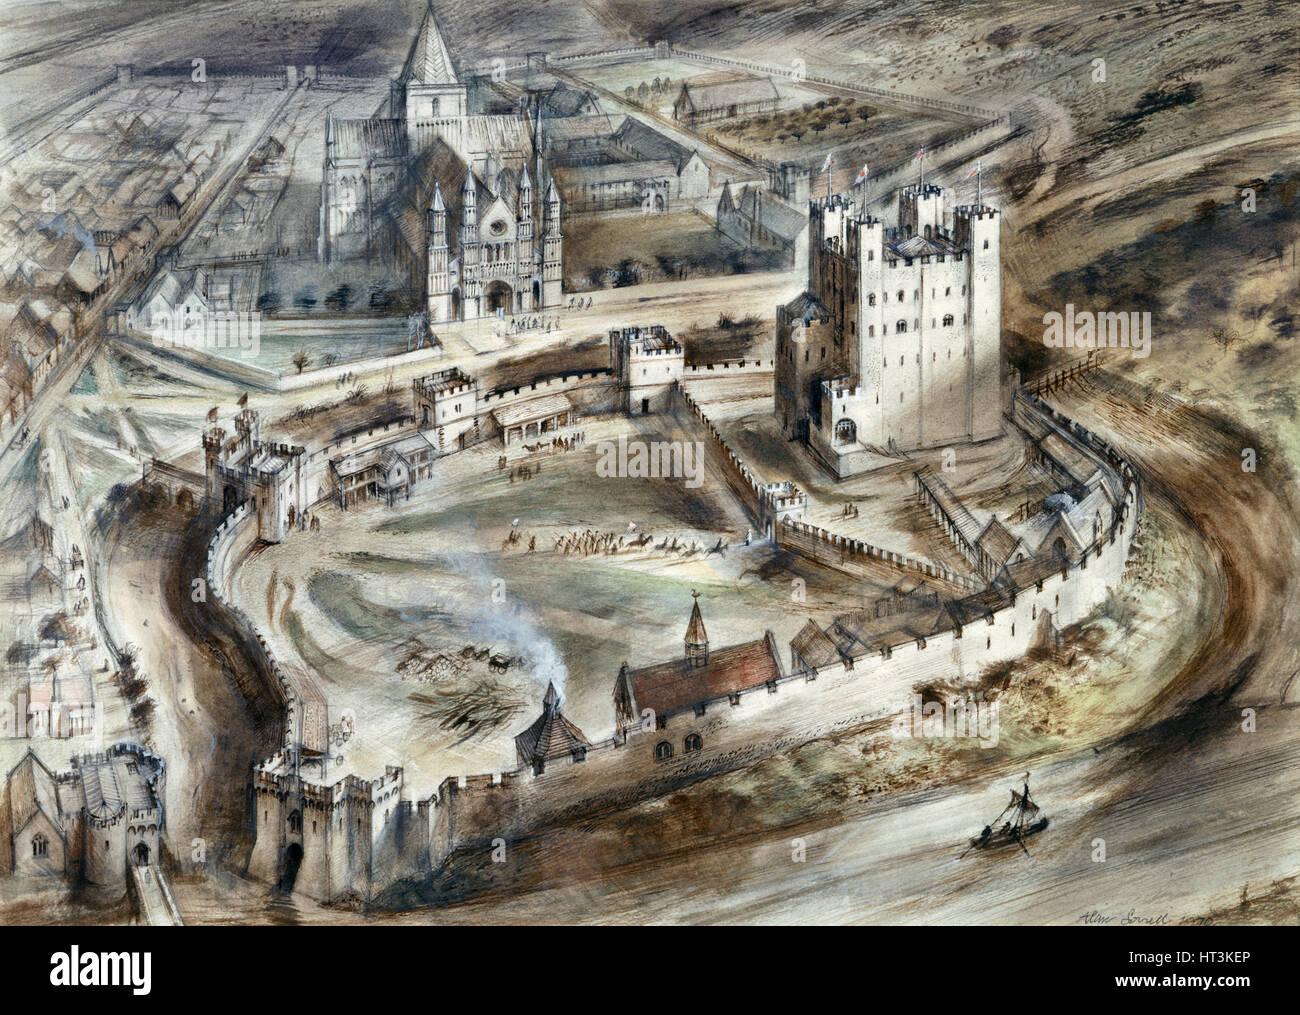 Rochester Castle, 15th century, (c1960s). Artist: Alan Ernest Sorrell. - Stock Image